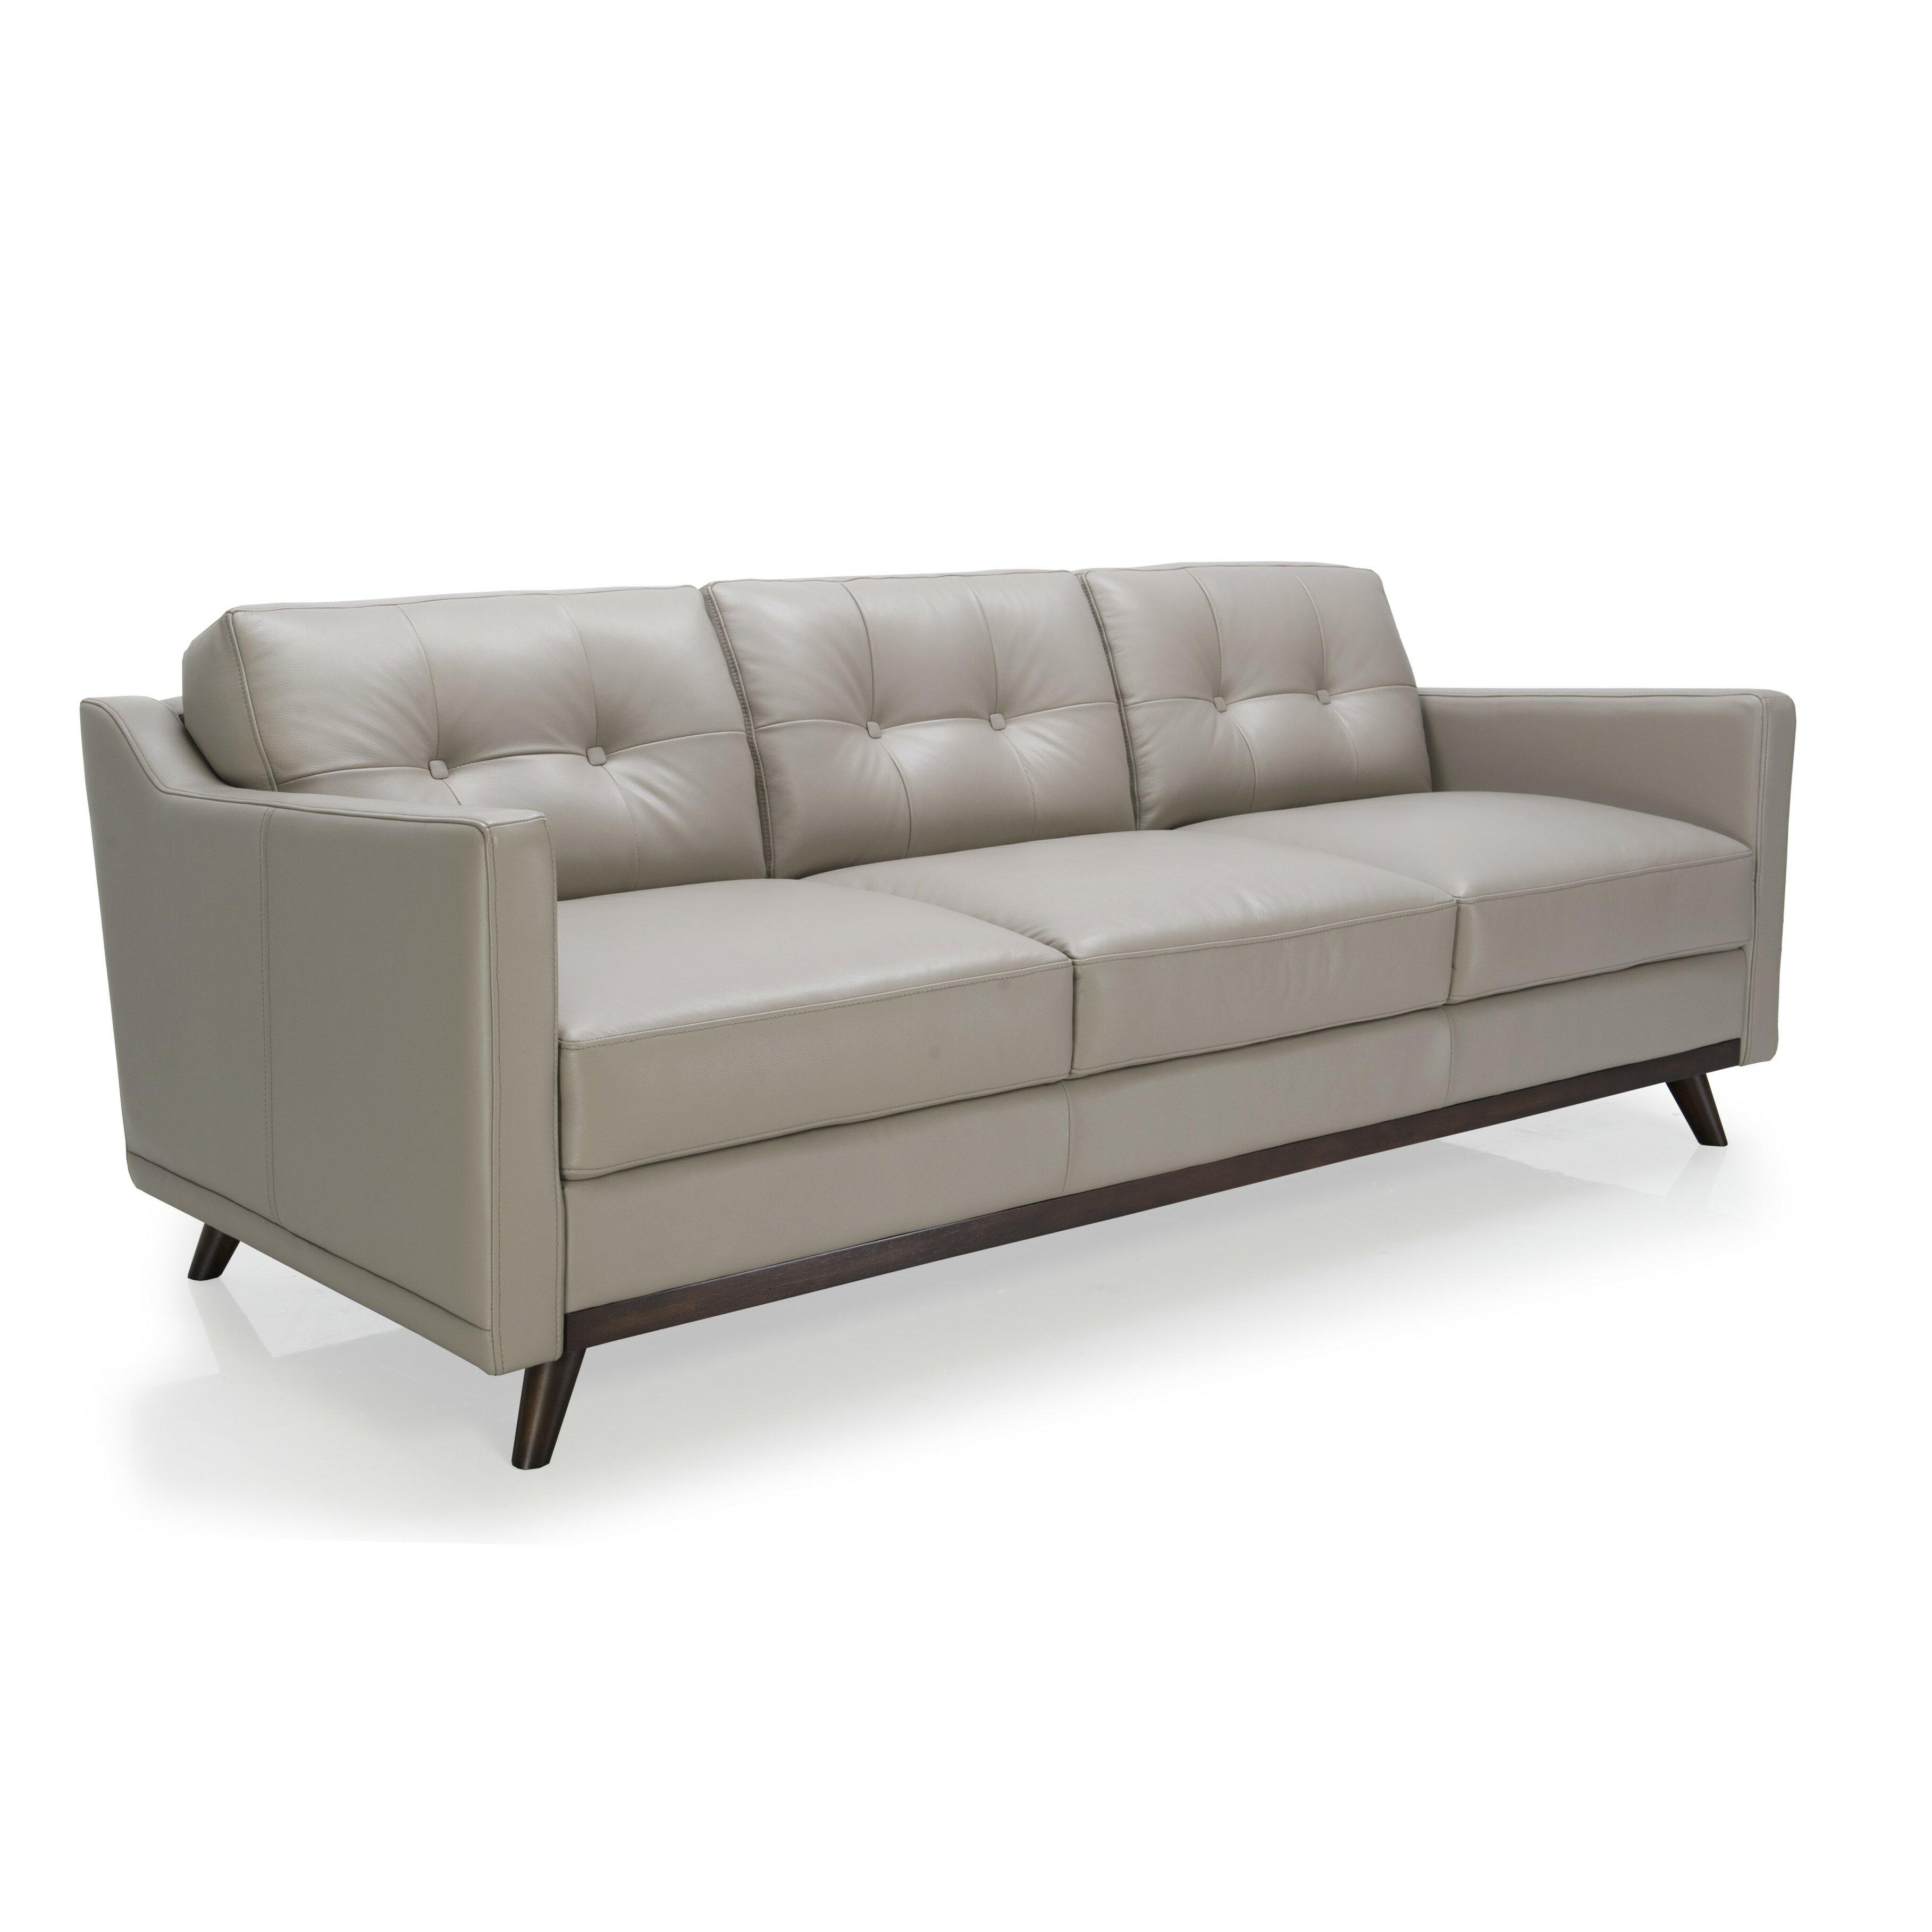 Moroni Monika Full Top Grain Leather Sofa Wayfair